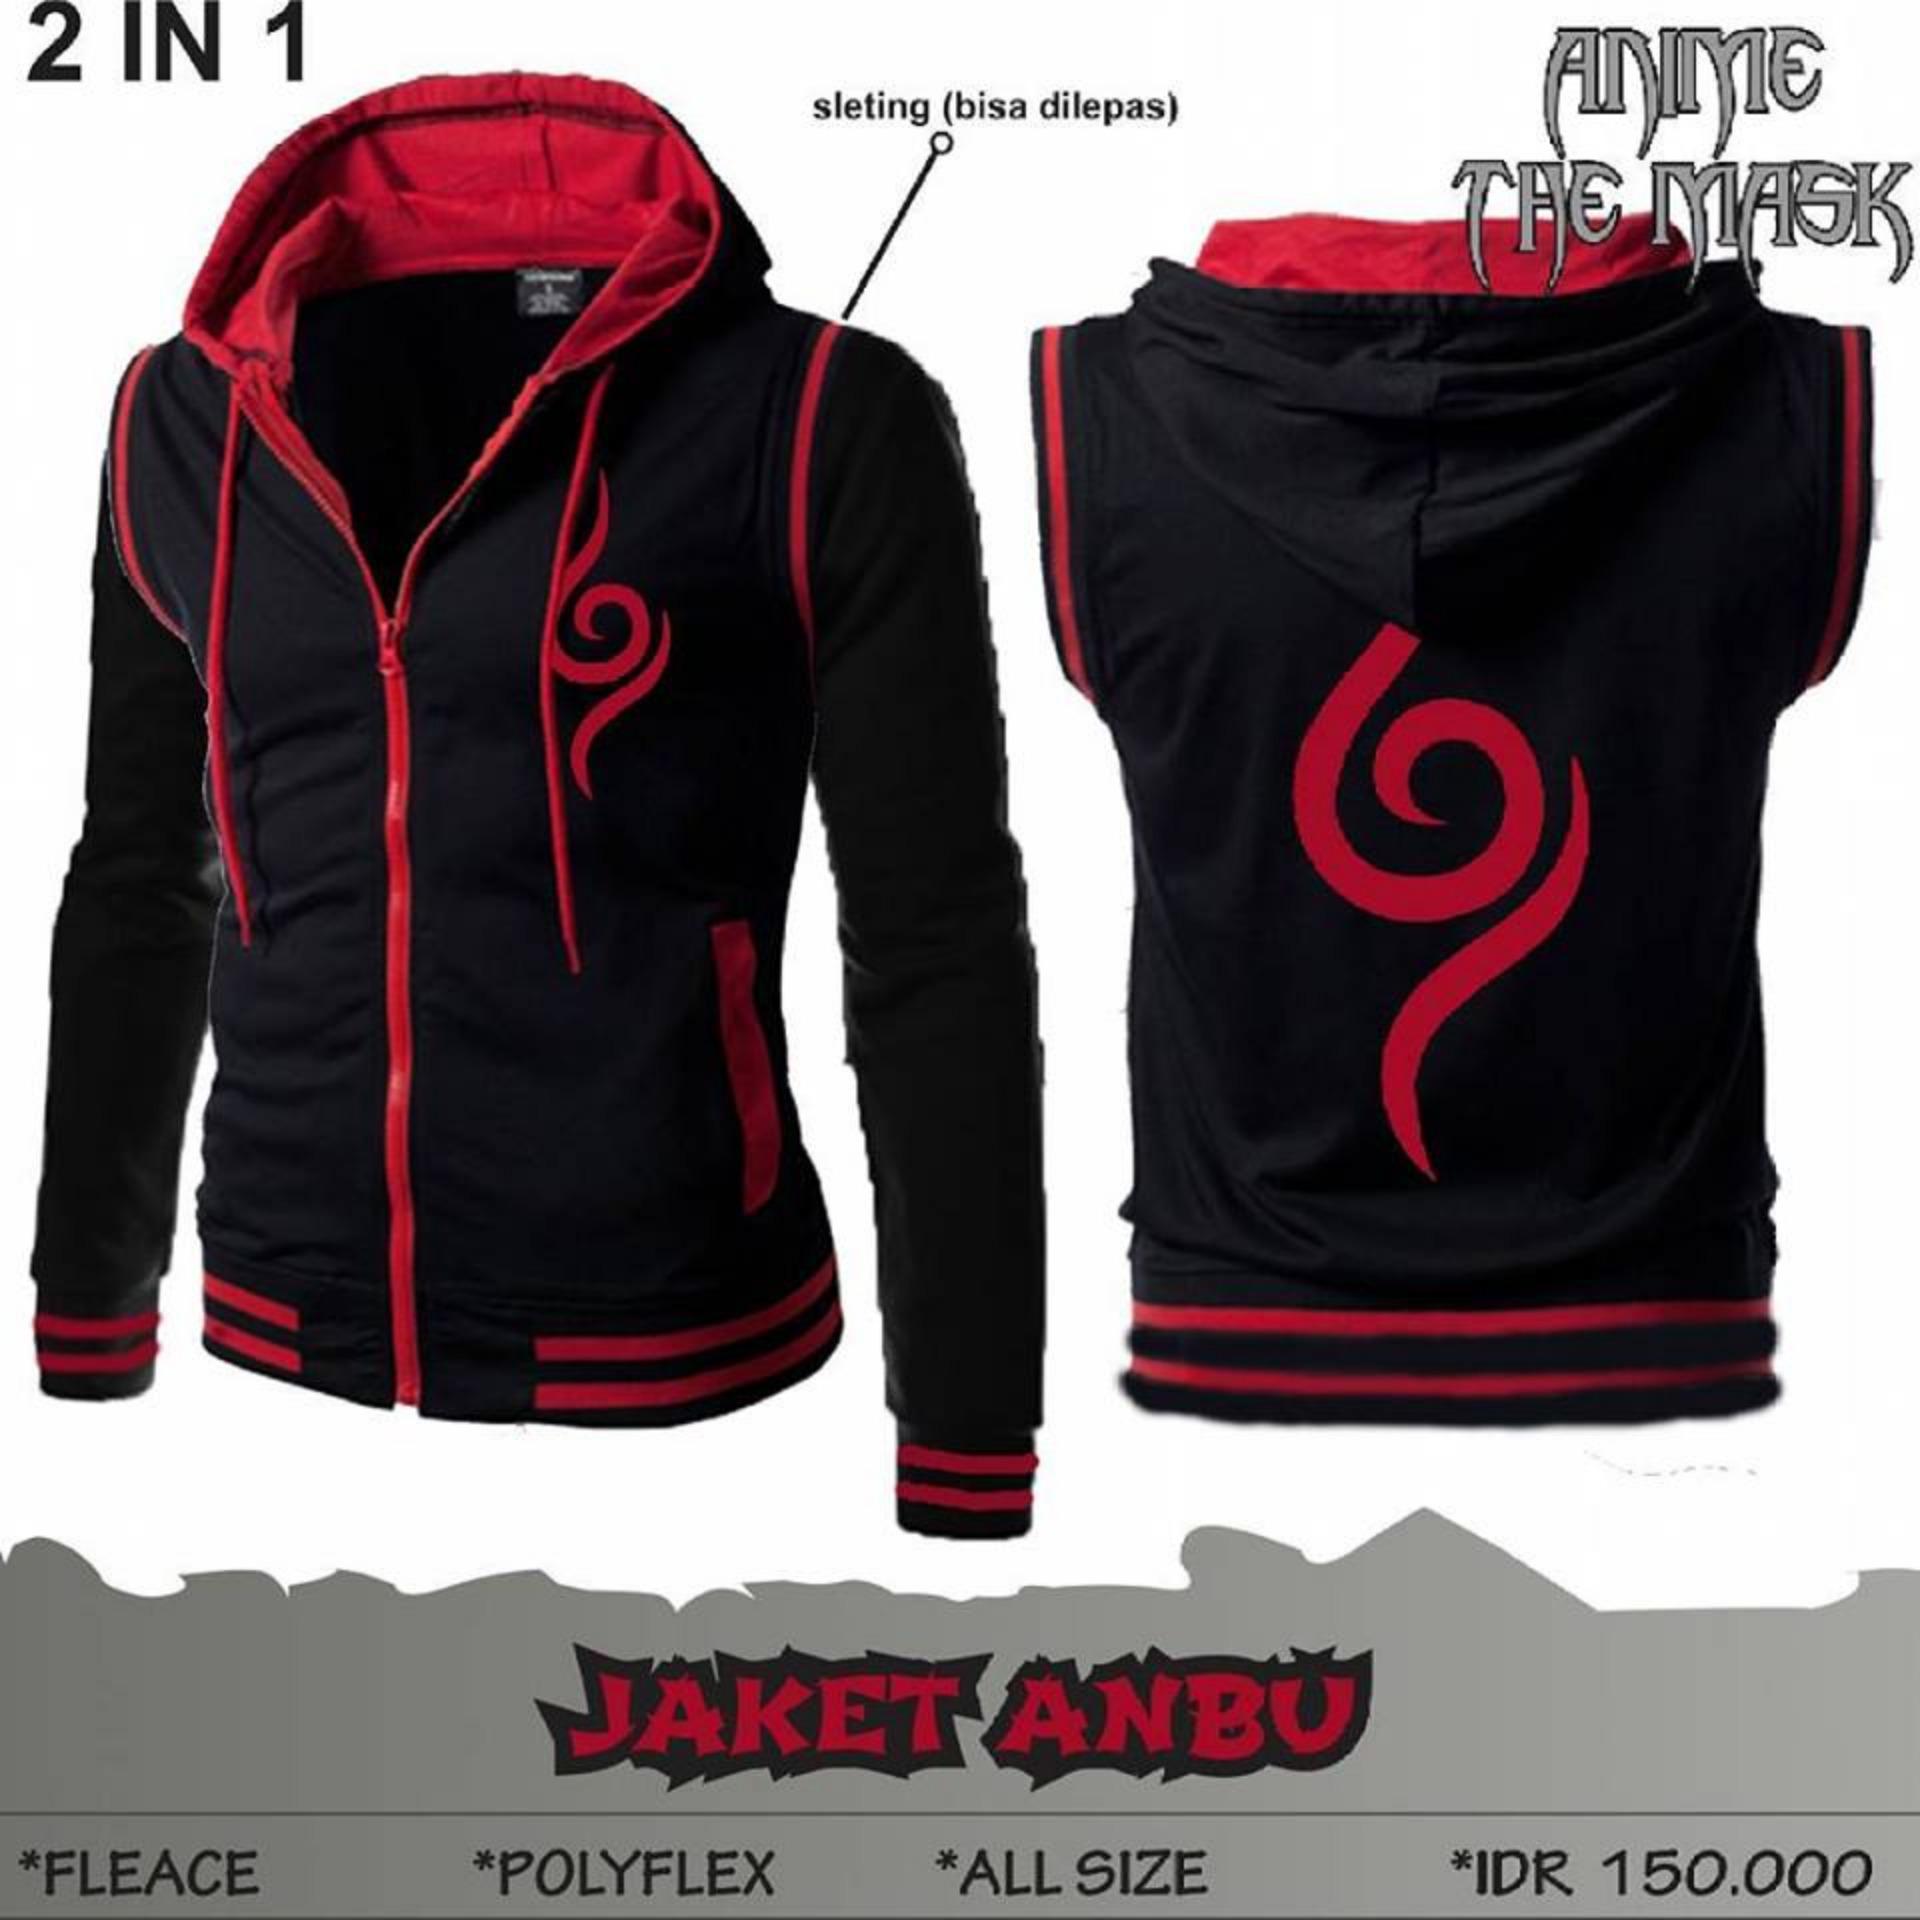 Beli Jaket Anime 2In1 Naruto Anbu Kredit Jawa Barat